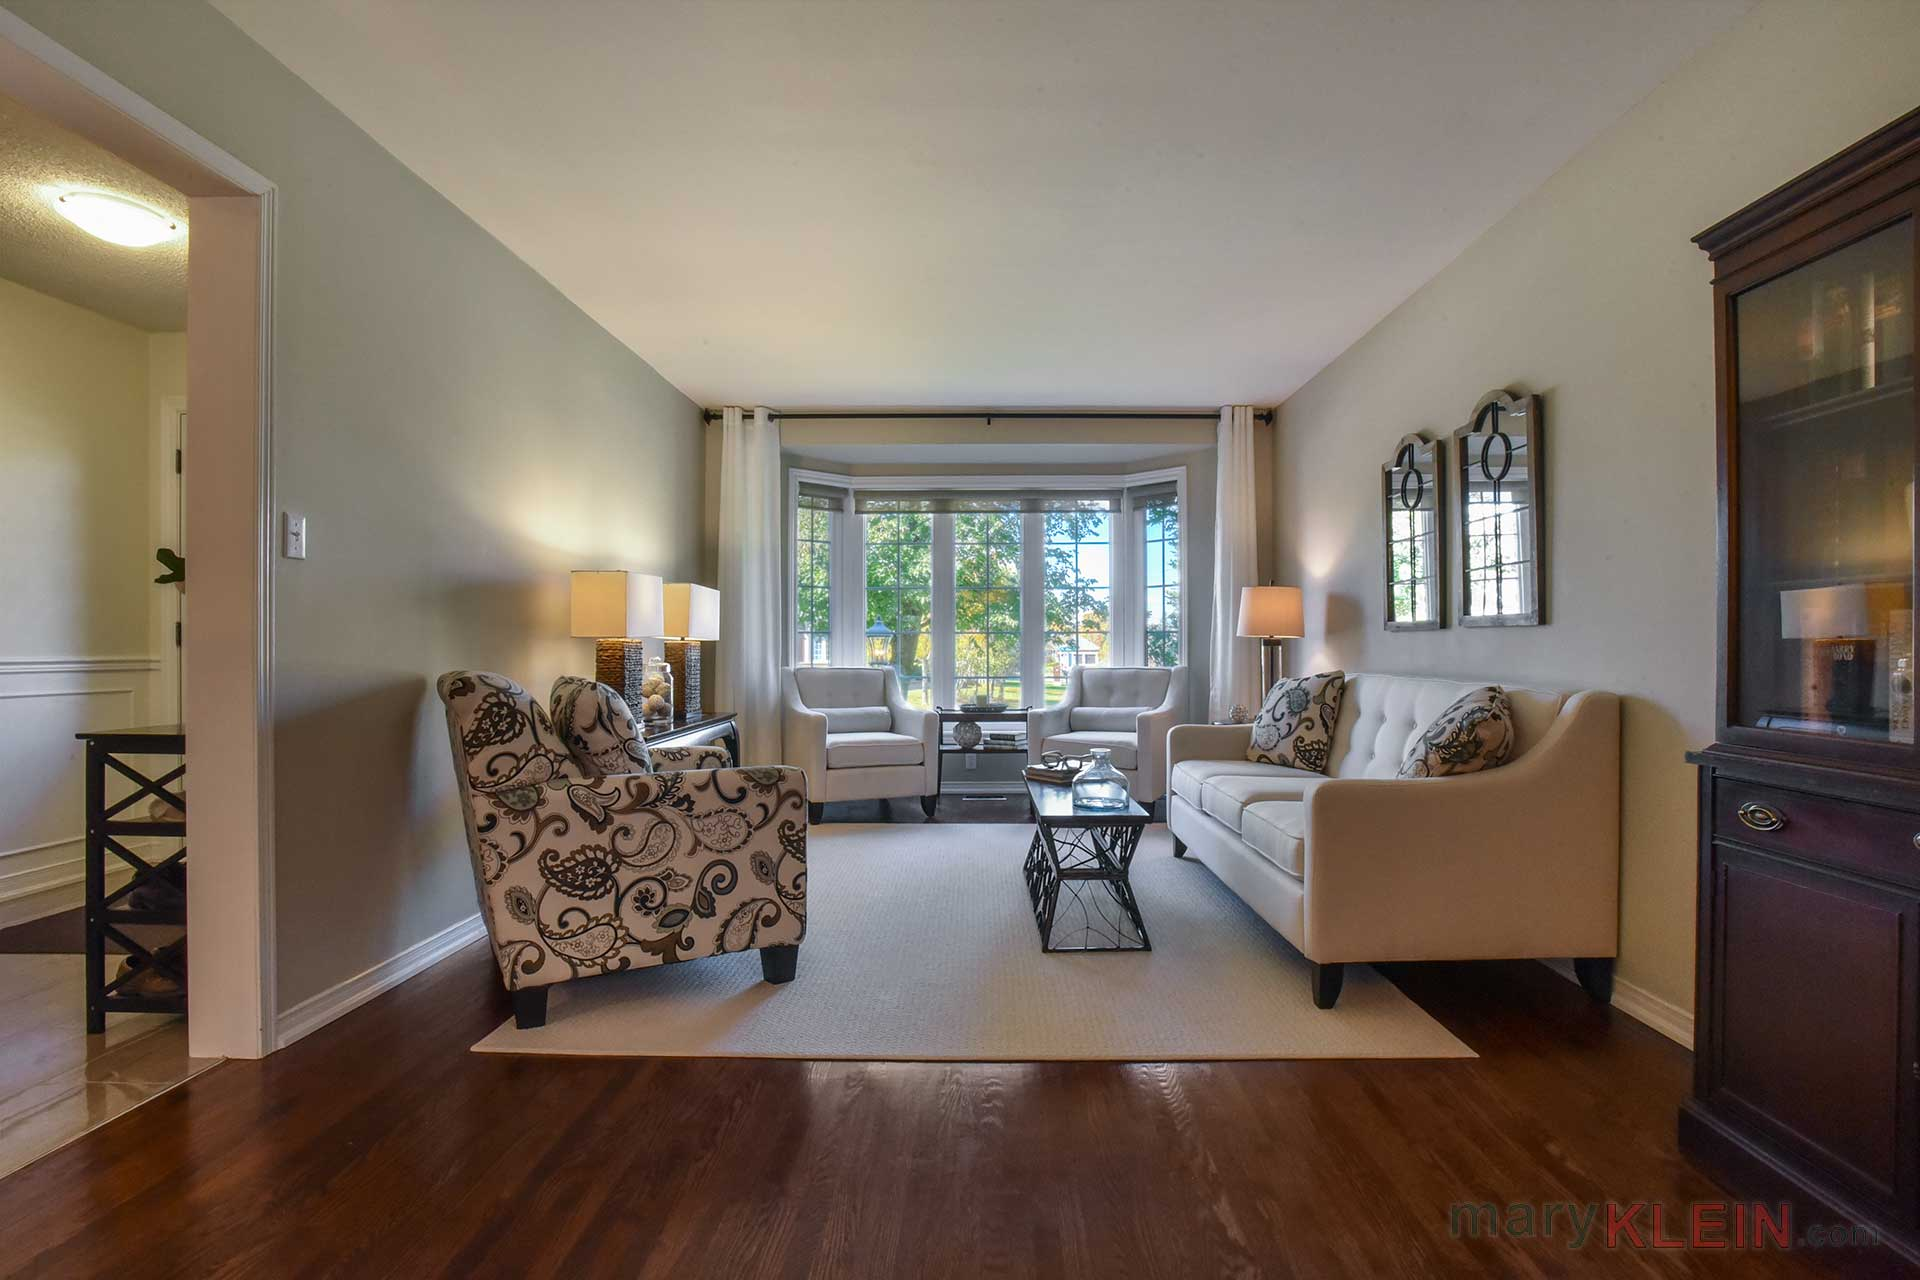 Living Room, Oak Flooring, Picture window, Hunter Douglas